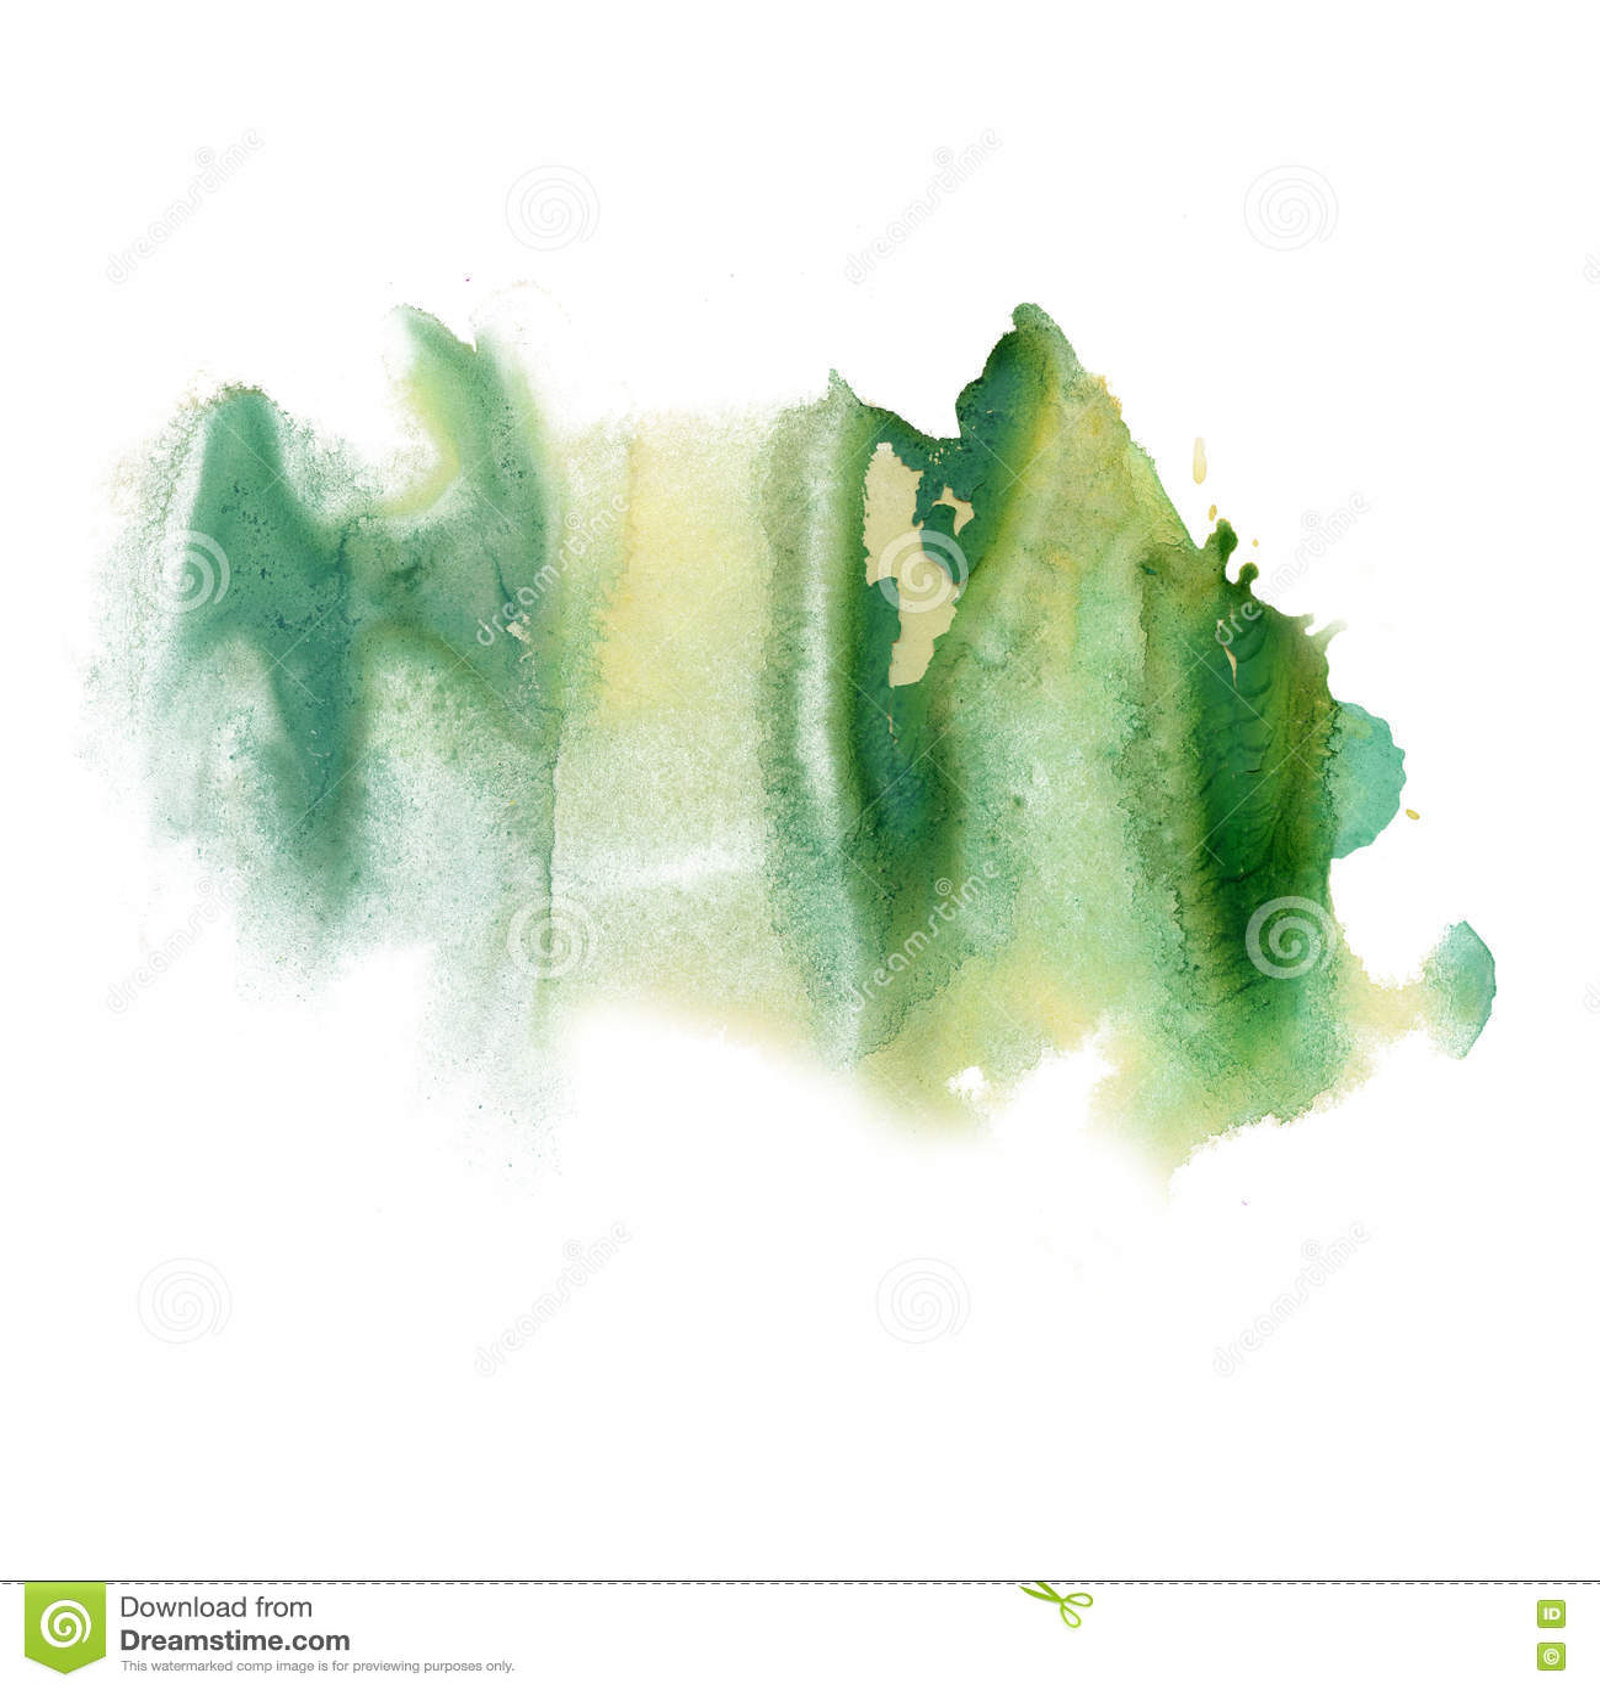 Textura macra de la mancha del punto de la acuarela líquida del tinte del verde del watercolour de la salpicadura de la tinta ais